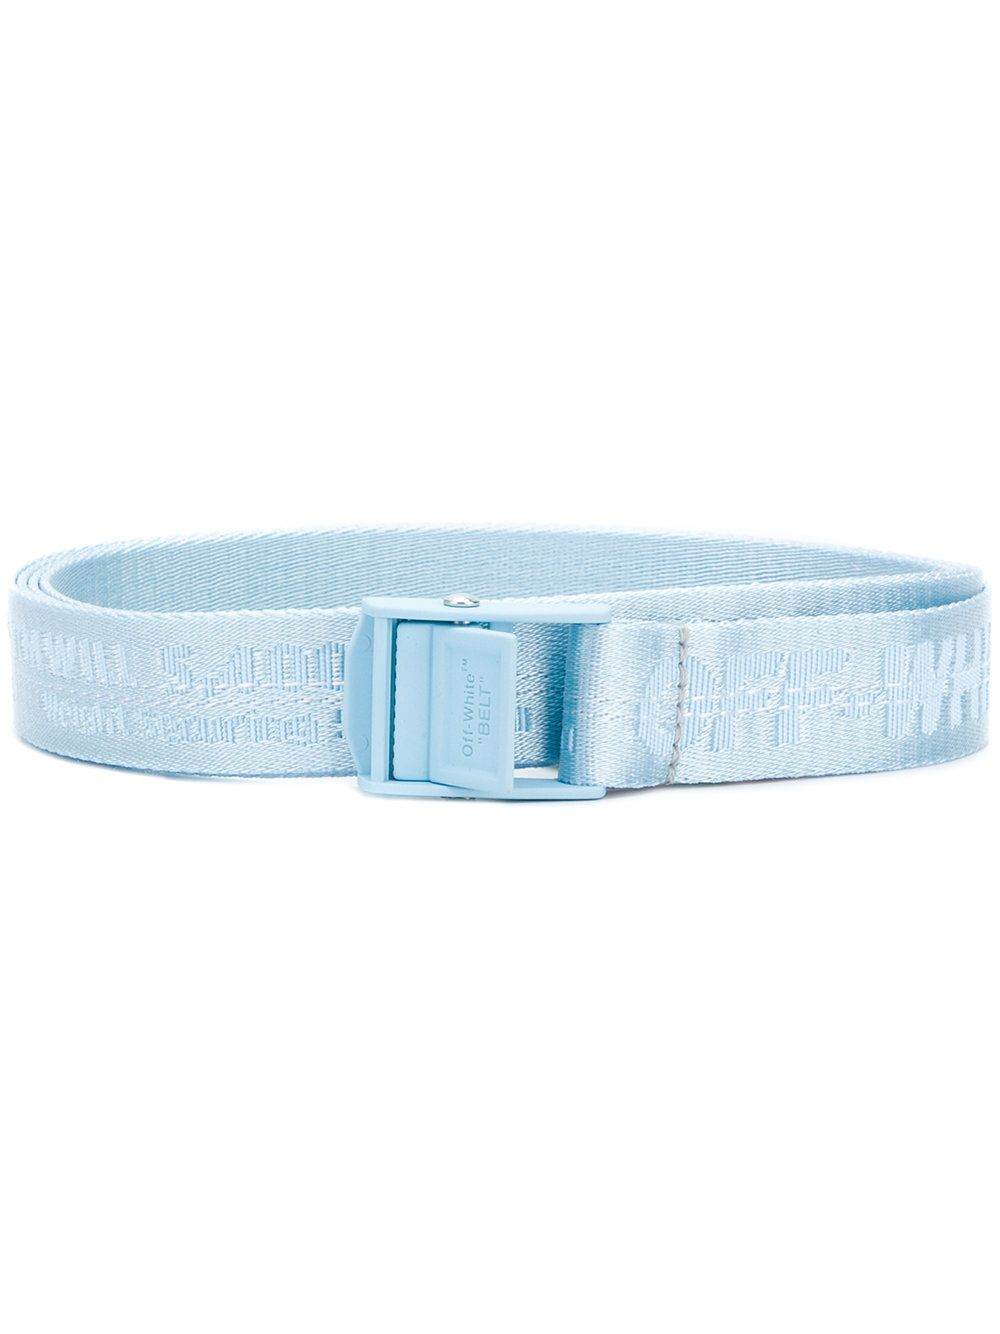 ed1e4abf842 OFF-WHITE BLUE. #off-white # | Off-White in 2019 | Off white belt ...